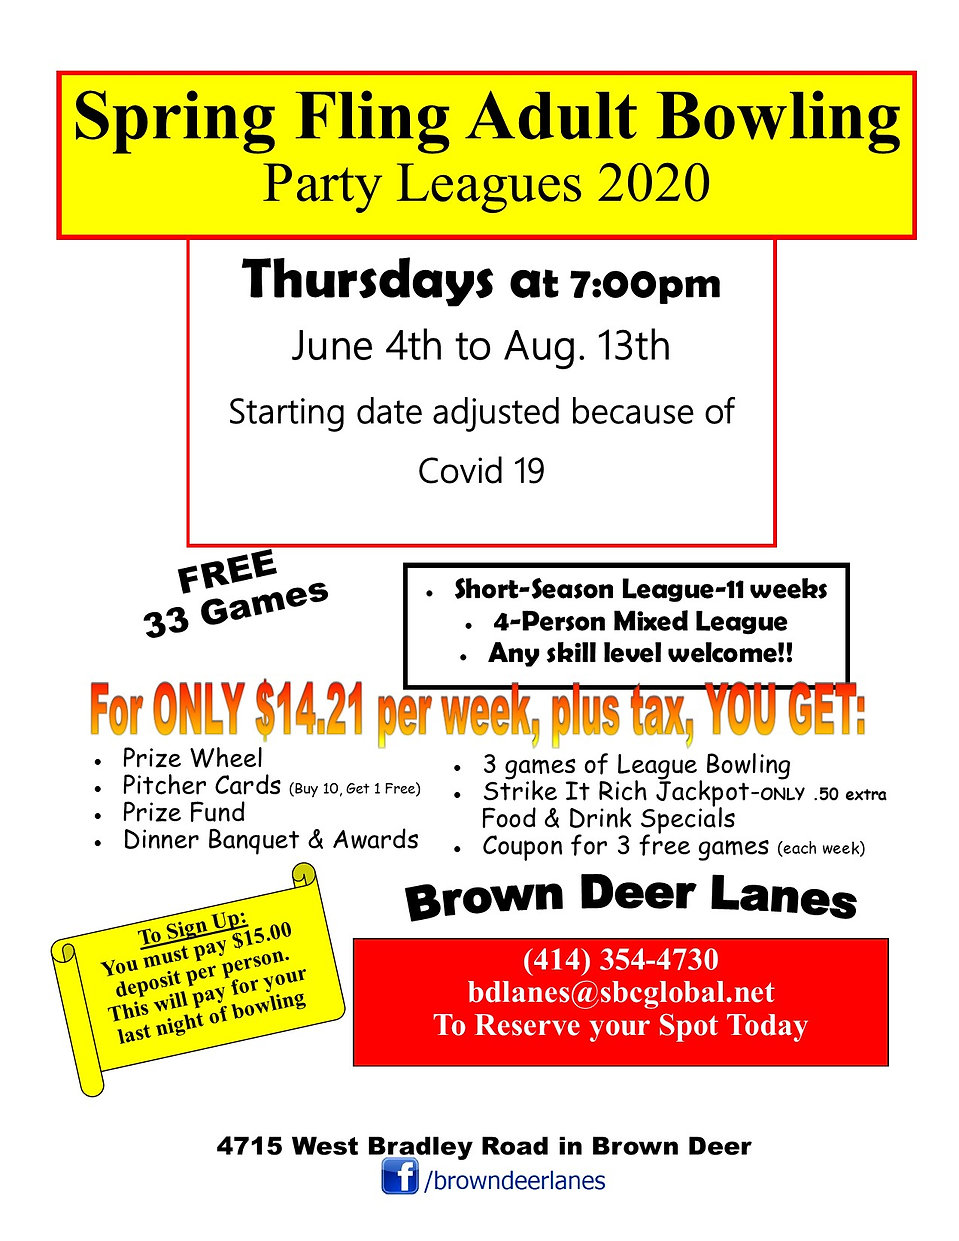 Party League Summer thursday 2020 covid